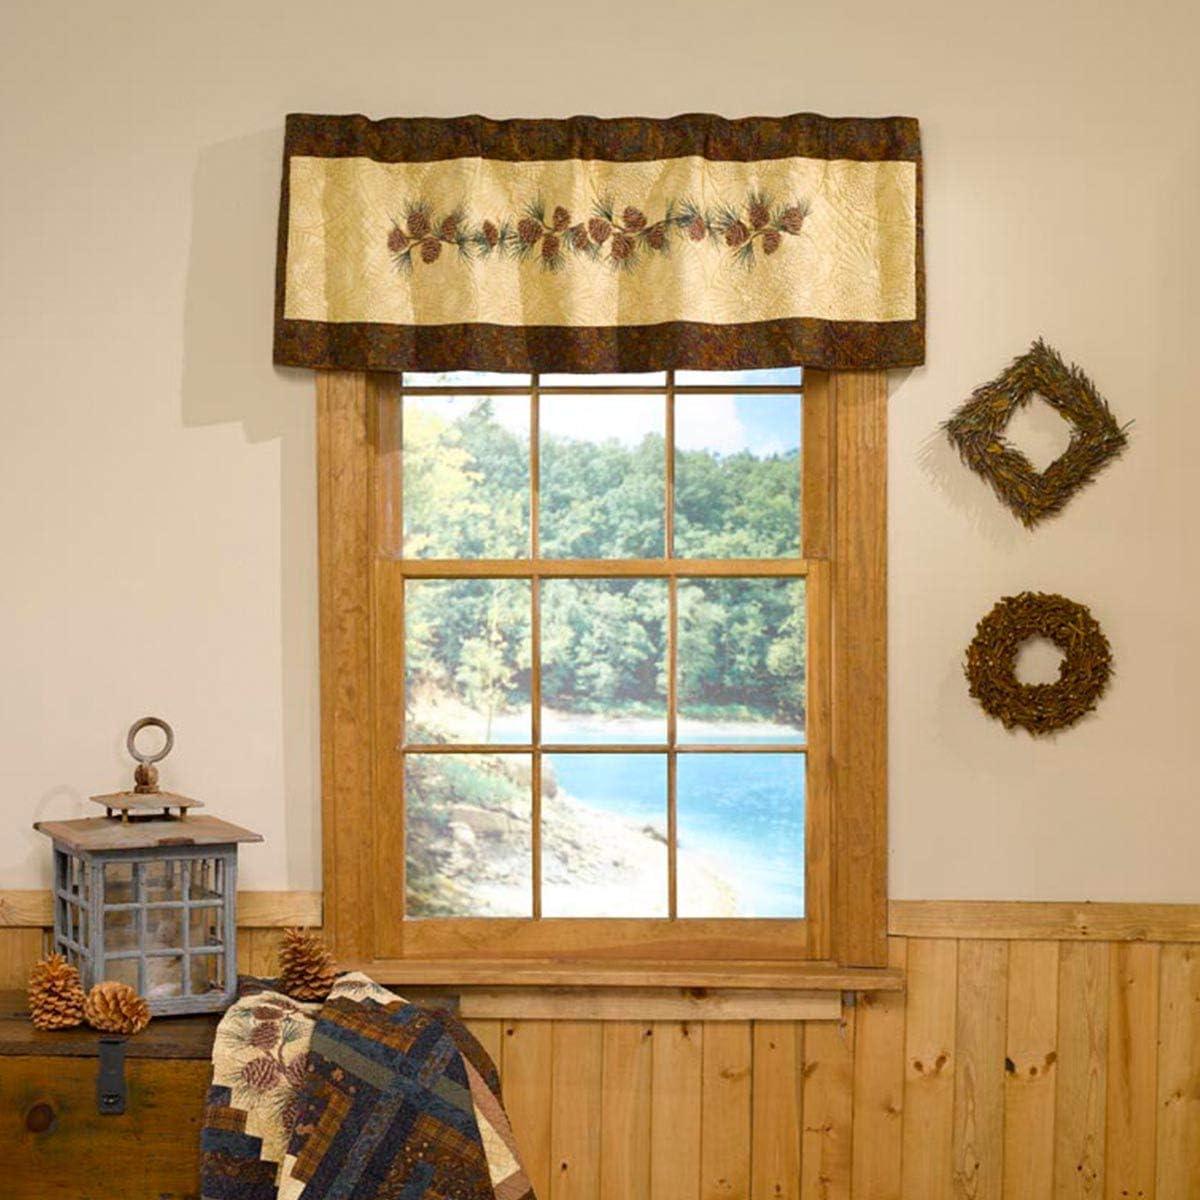 Donna Sharp Valance – Cabin Raising Pine Cone Lodge Decorative Window Treatment with Pine Cone Pattern